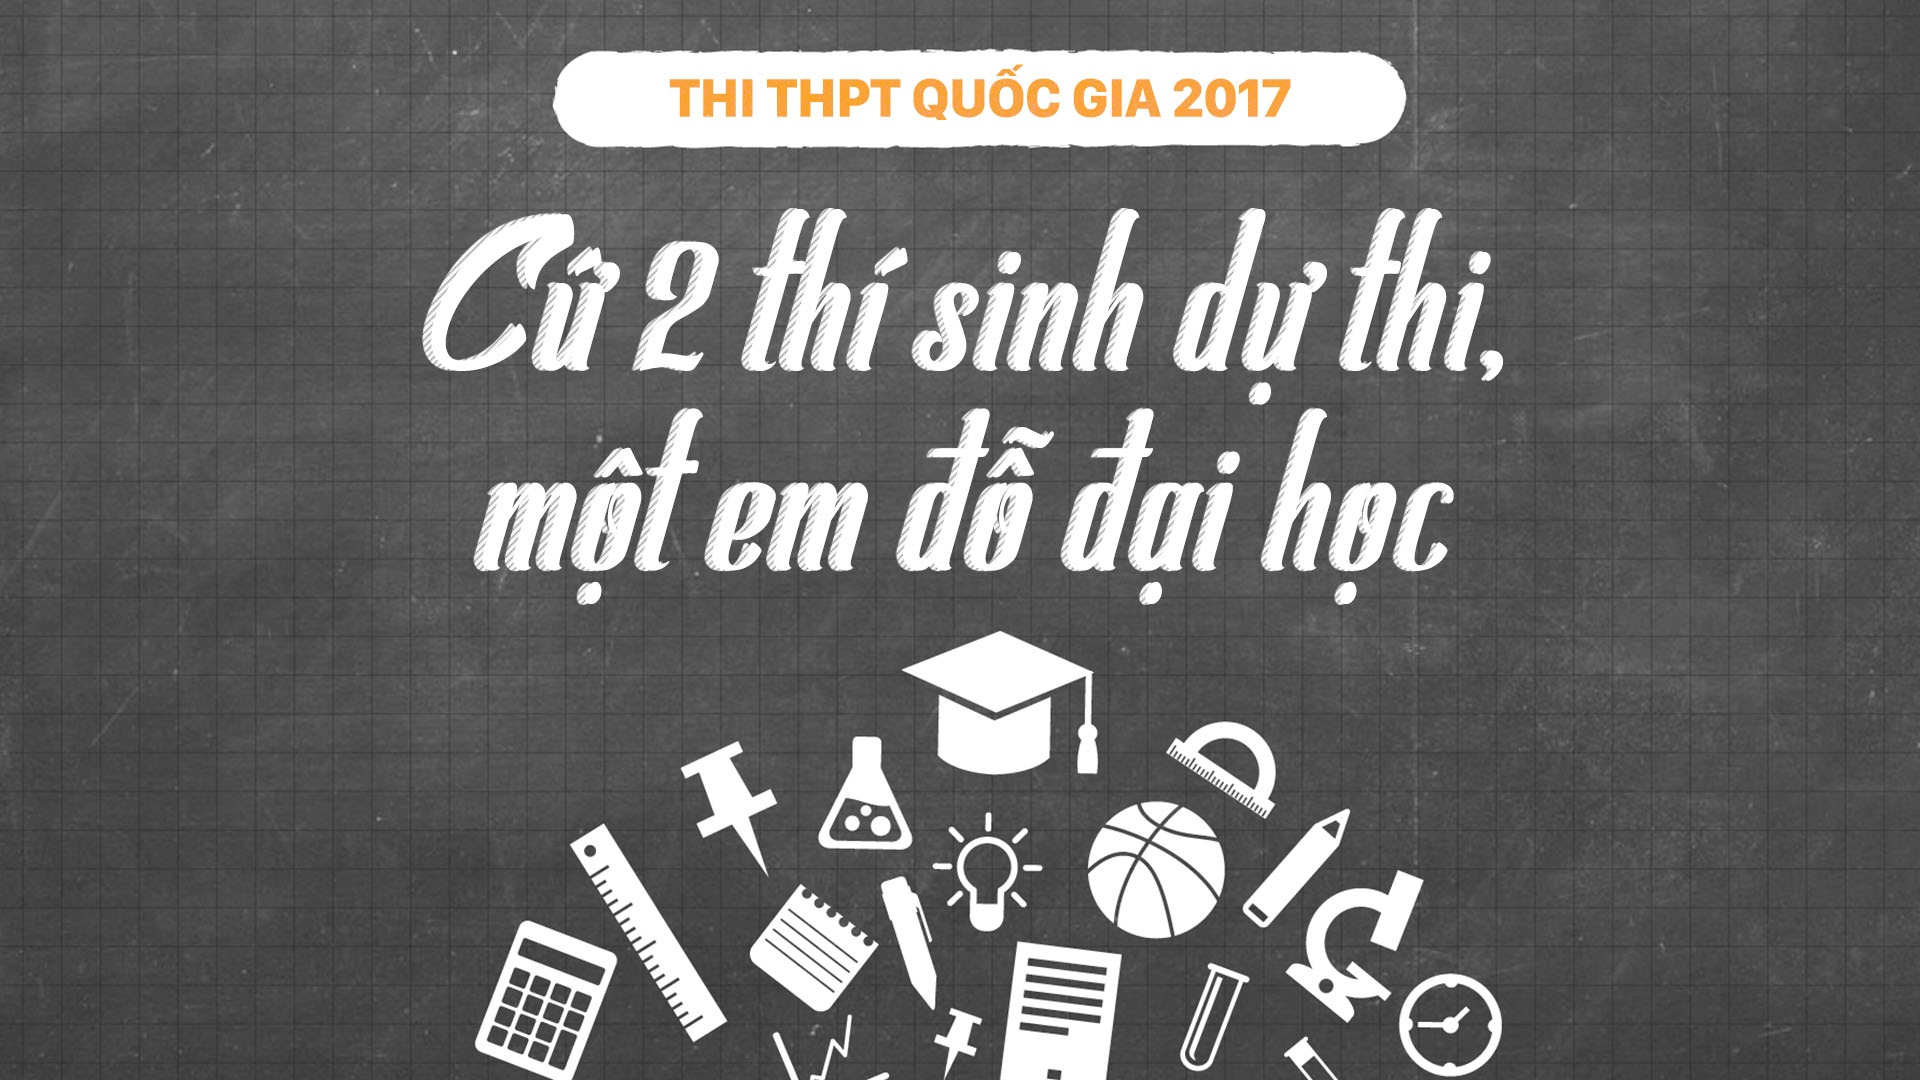 THPT quoc gia 2017: Cu 2 thi sinh du thi, mot em do dai hoc, cao dang hinh anh 1